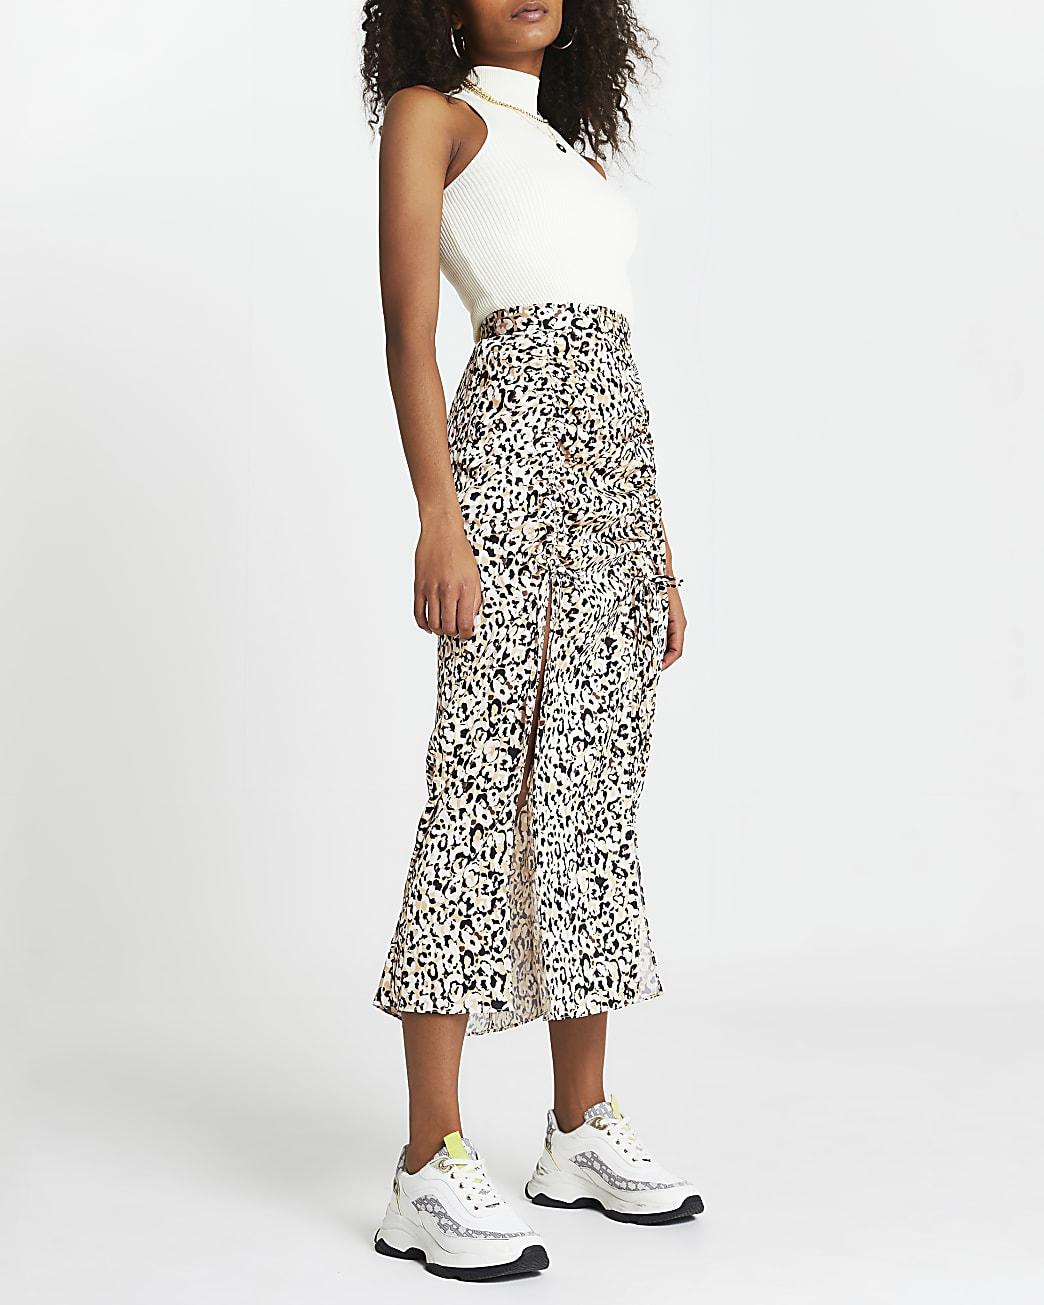 Beige animal print ruched skirt